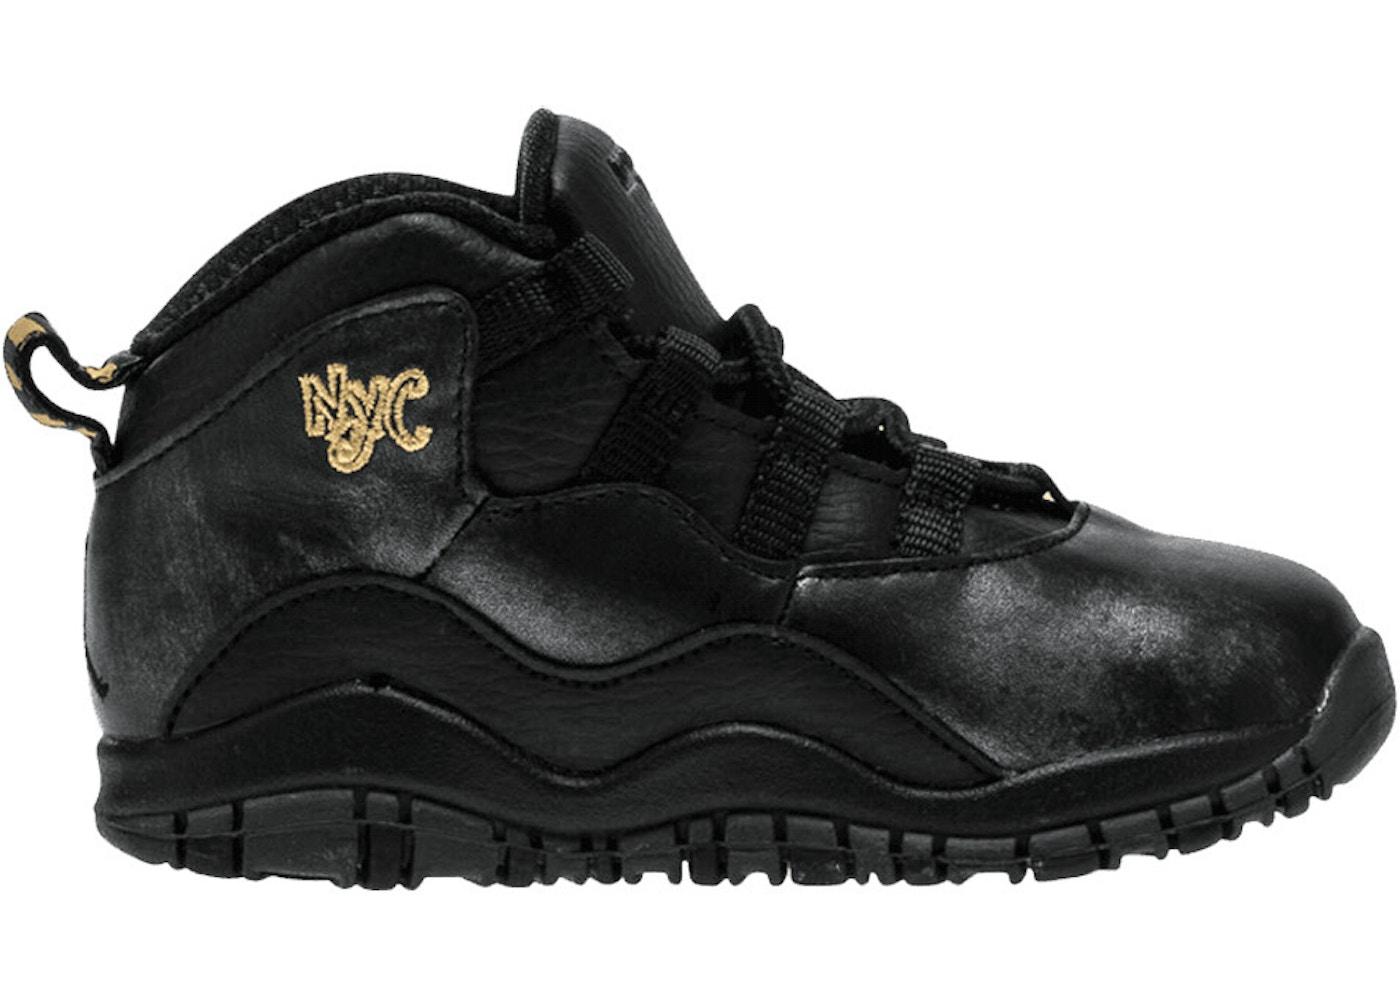 competitive price e0c34 811f2 Jordan 10 Retro TD NYC (Toddler)